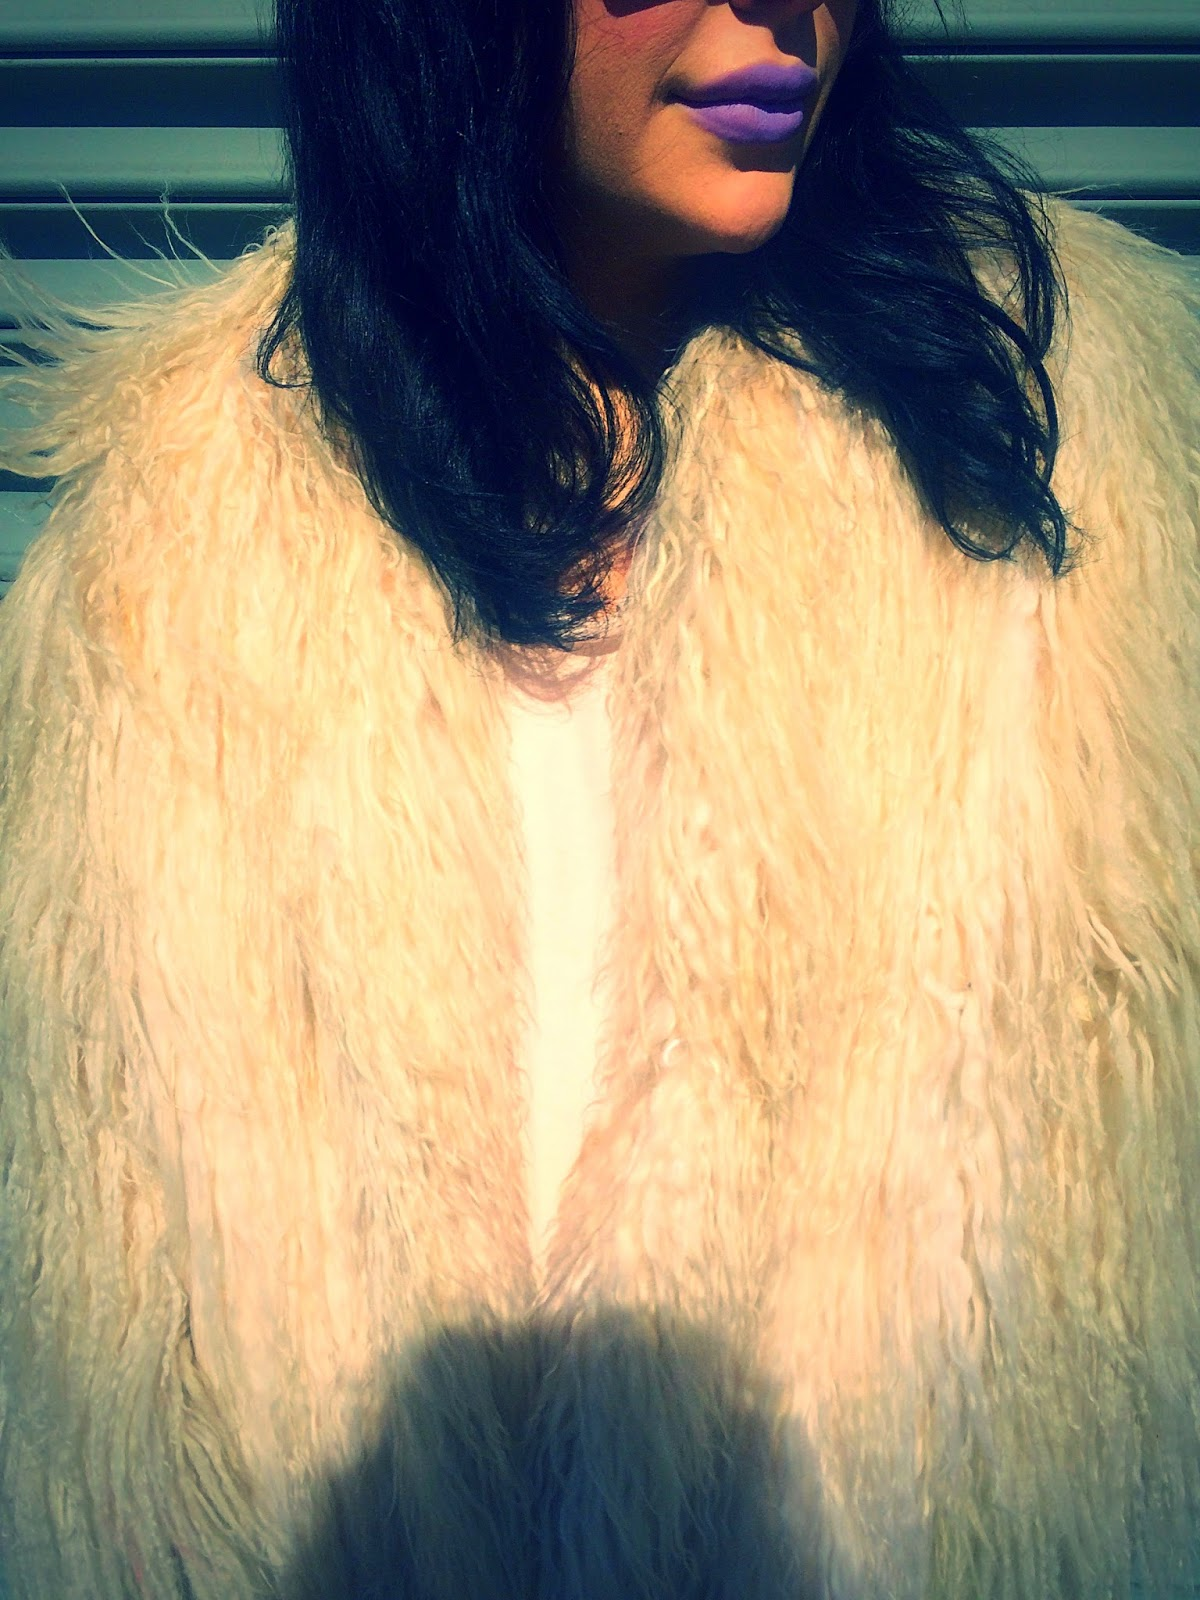 Kat Von D Coven lipstick, lilace lipstick, vintage white shag coat, furry long coat, wearing purple lipstick, how to wear lavender lipstick, KatVonD makeup lips